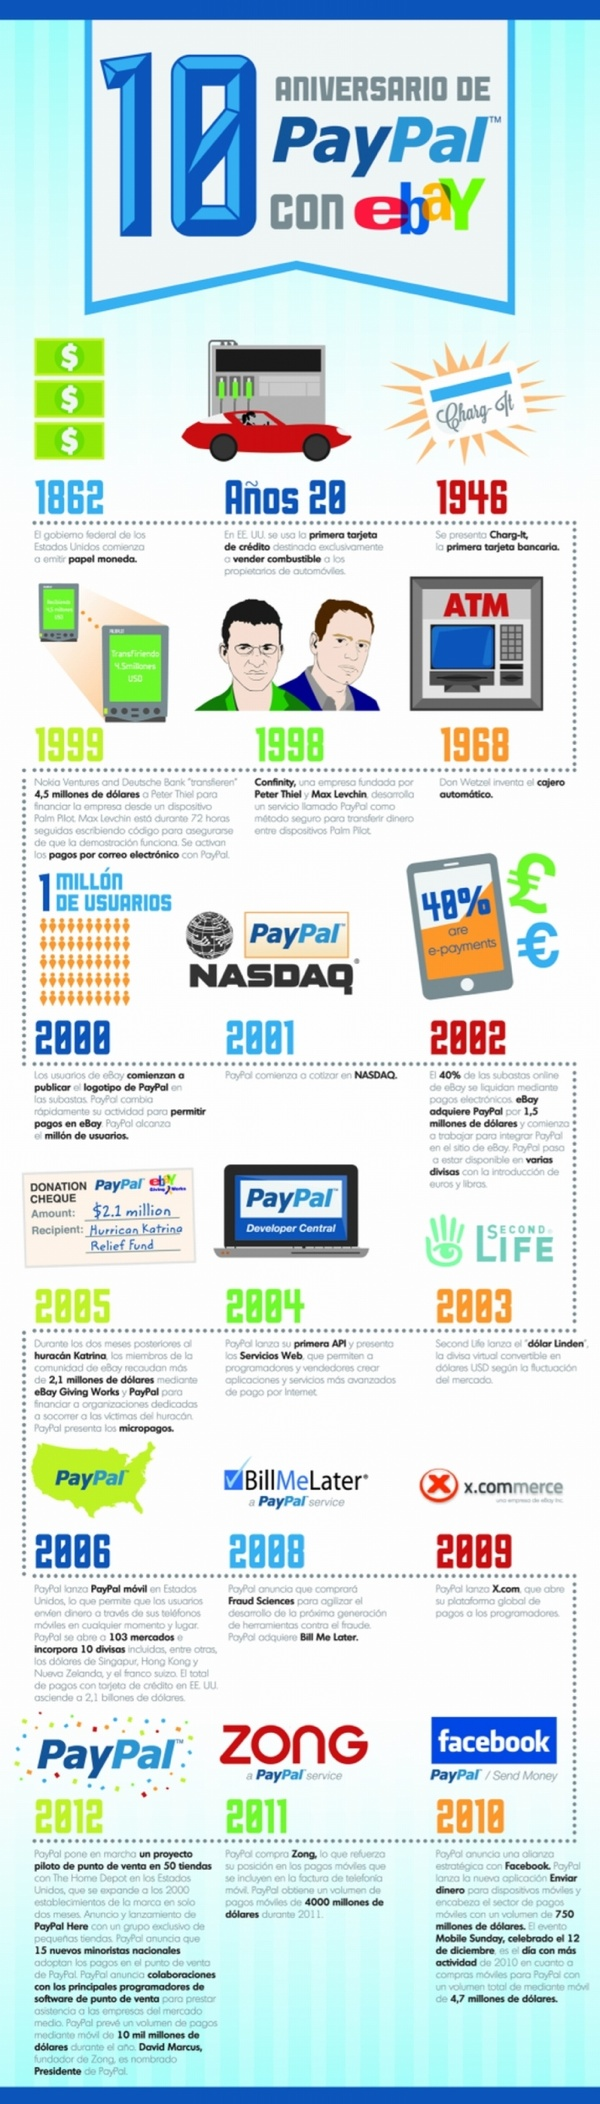 10 años de #PayPal con #eBay #Infografia #Infografie #Infographic